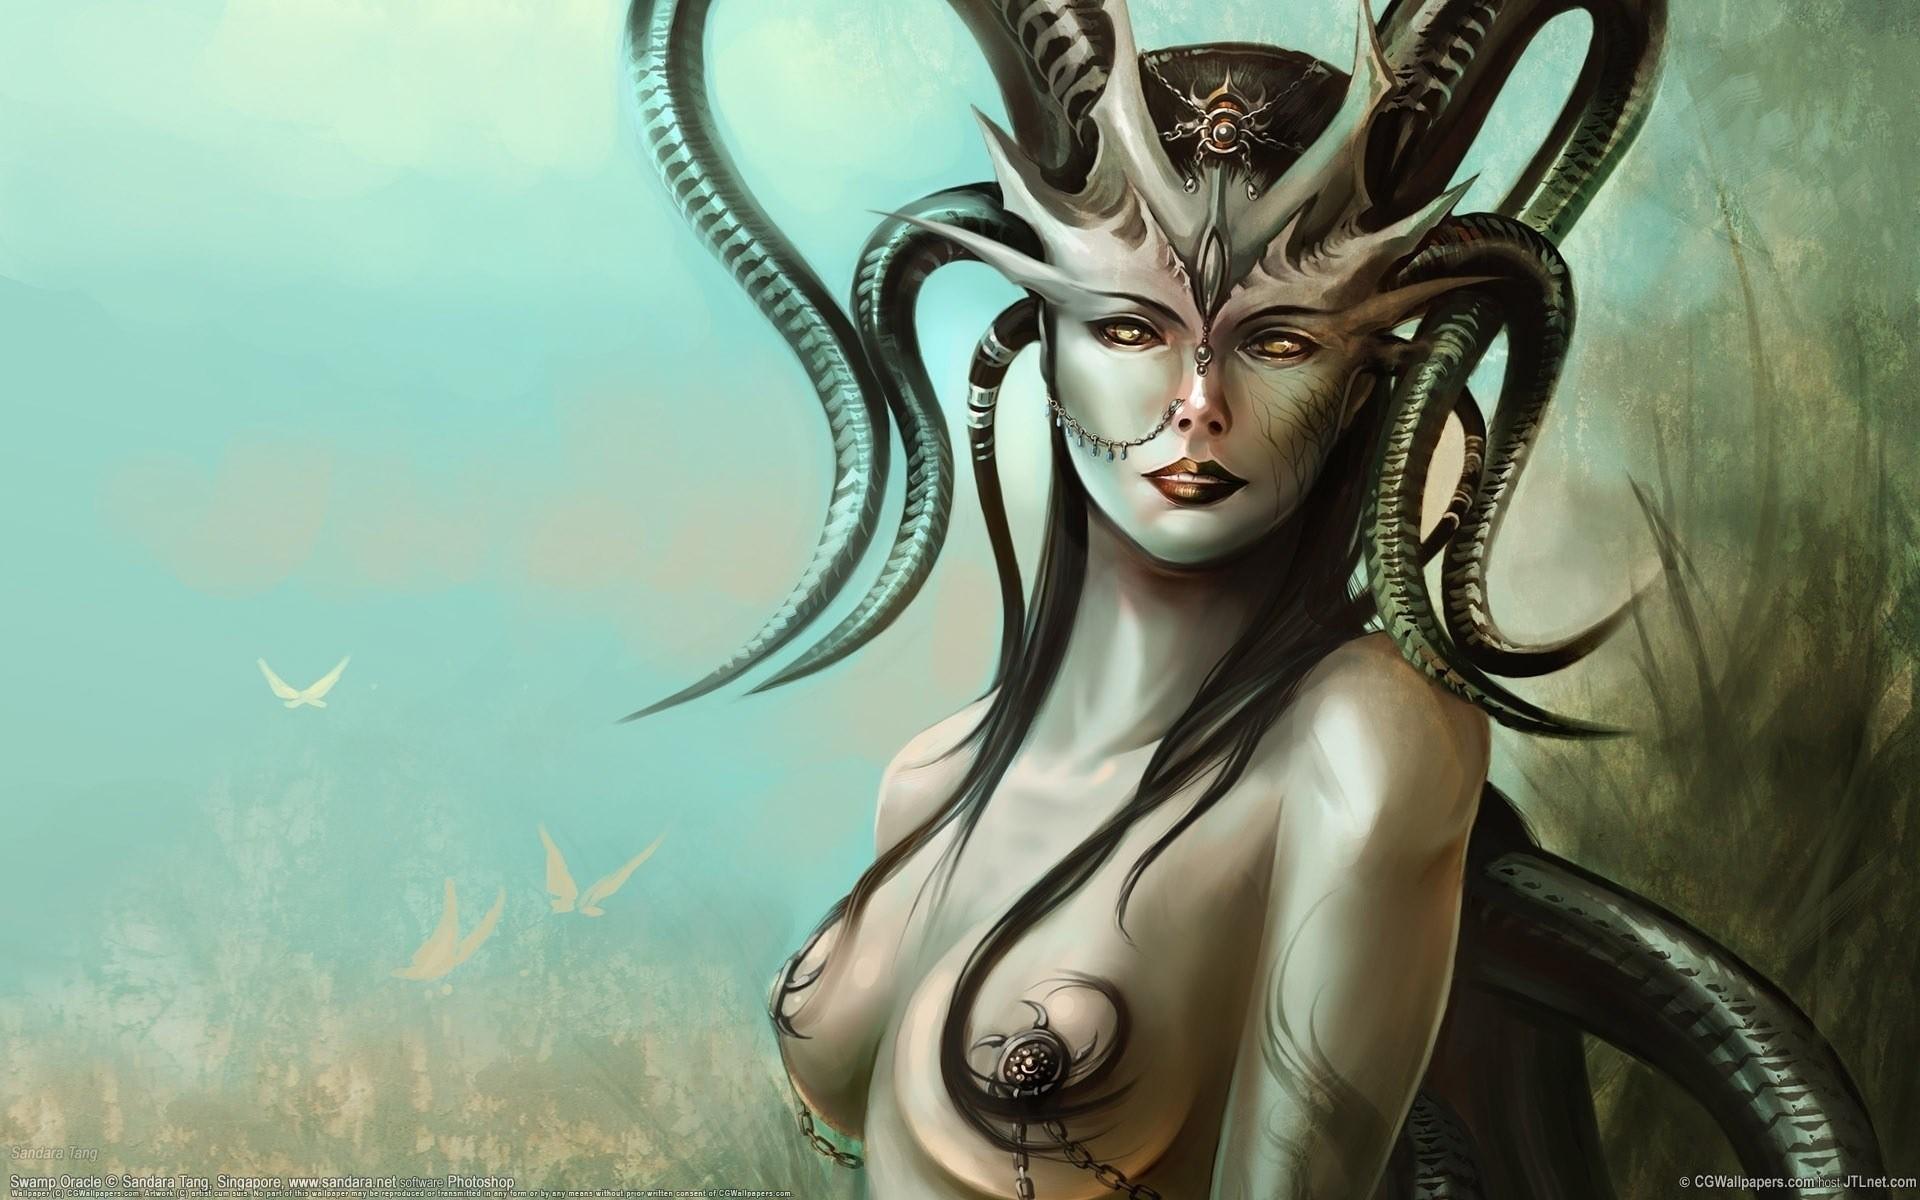 Female nude fantasy movie hentai clip